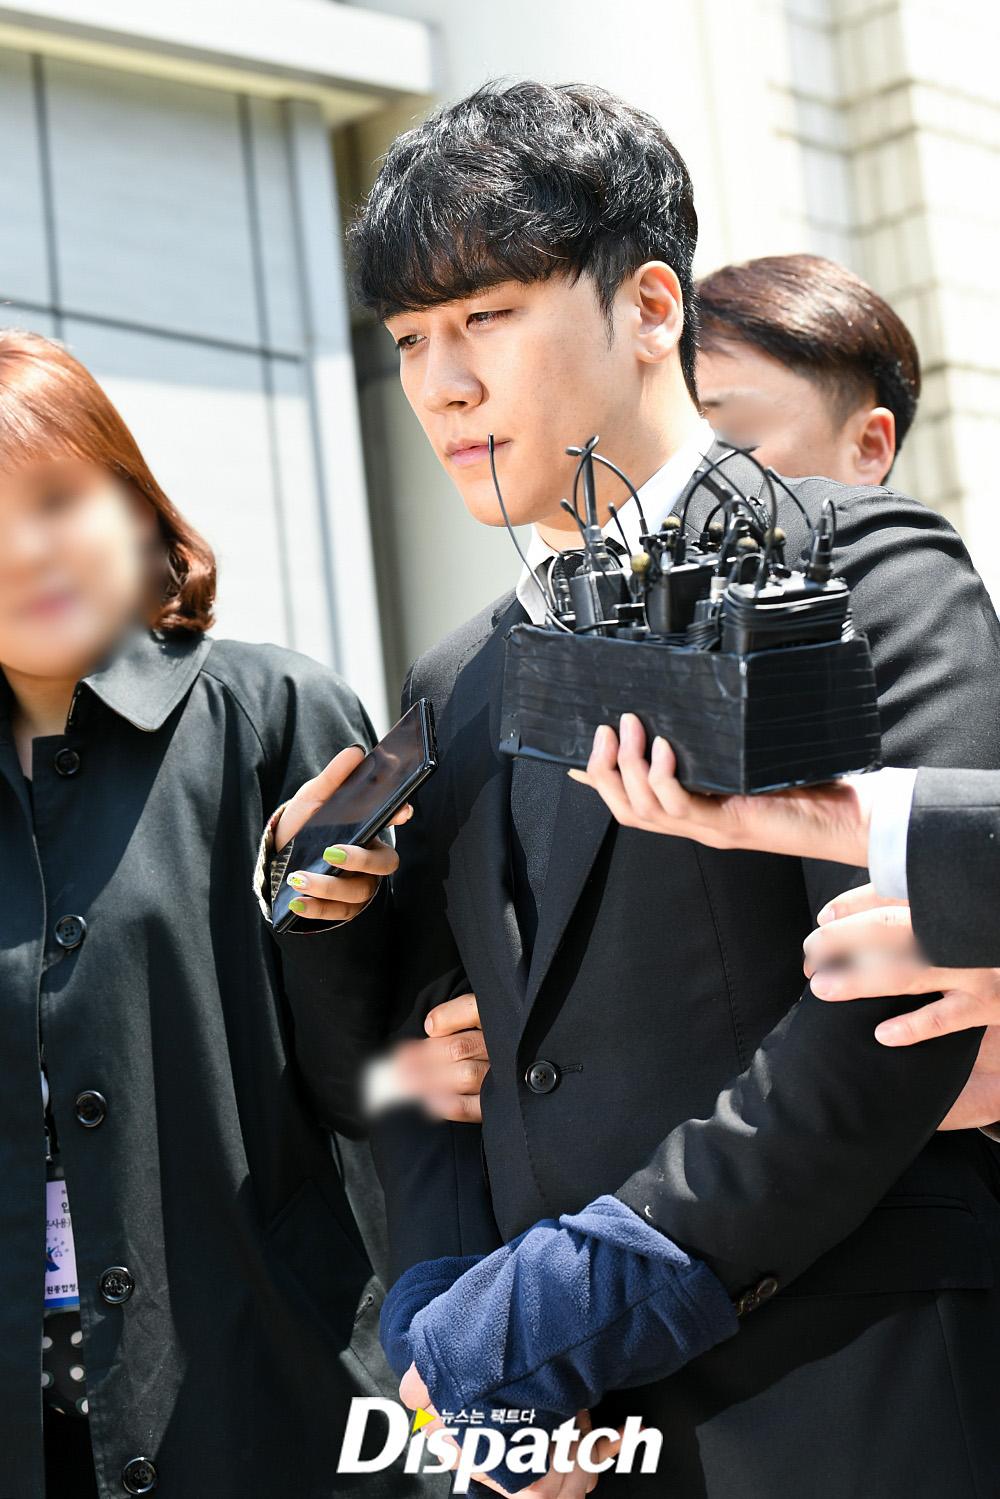 seungri handcuffed 6